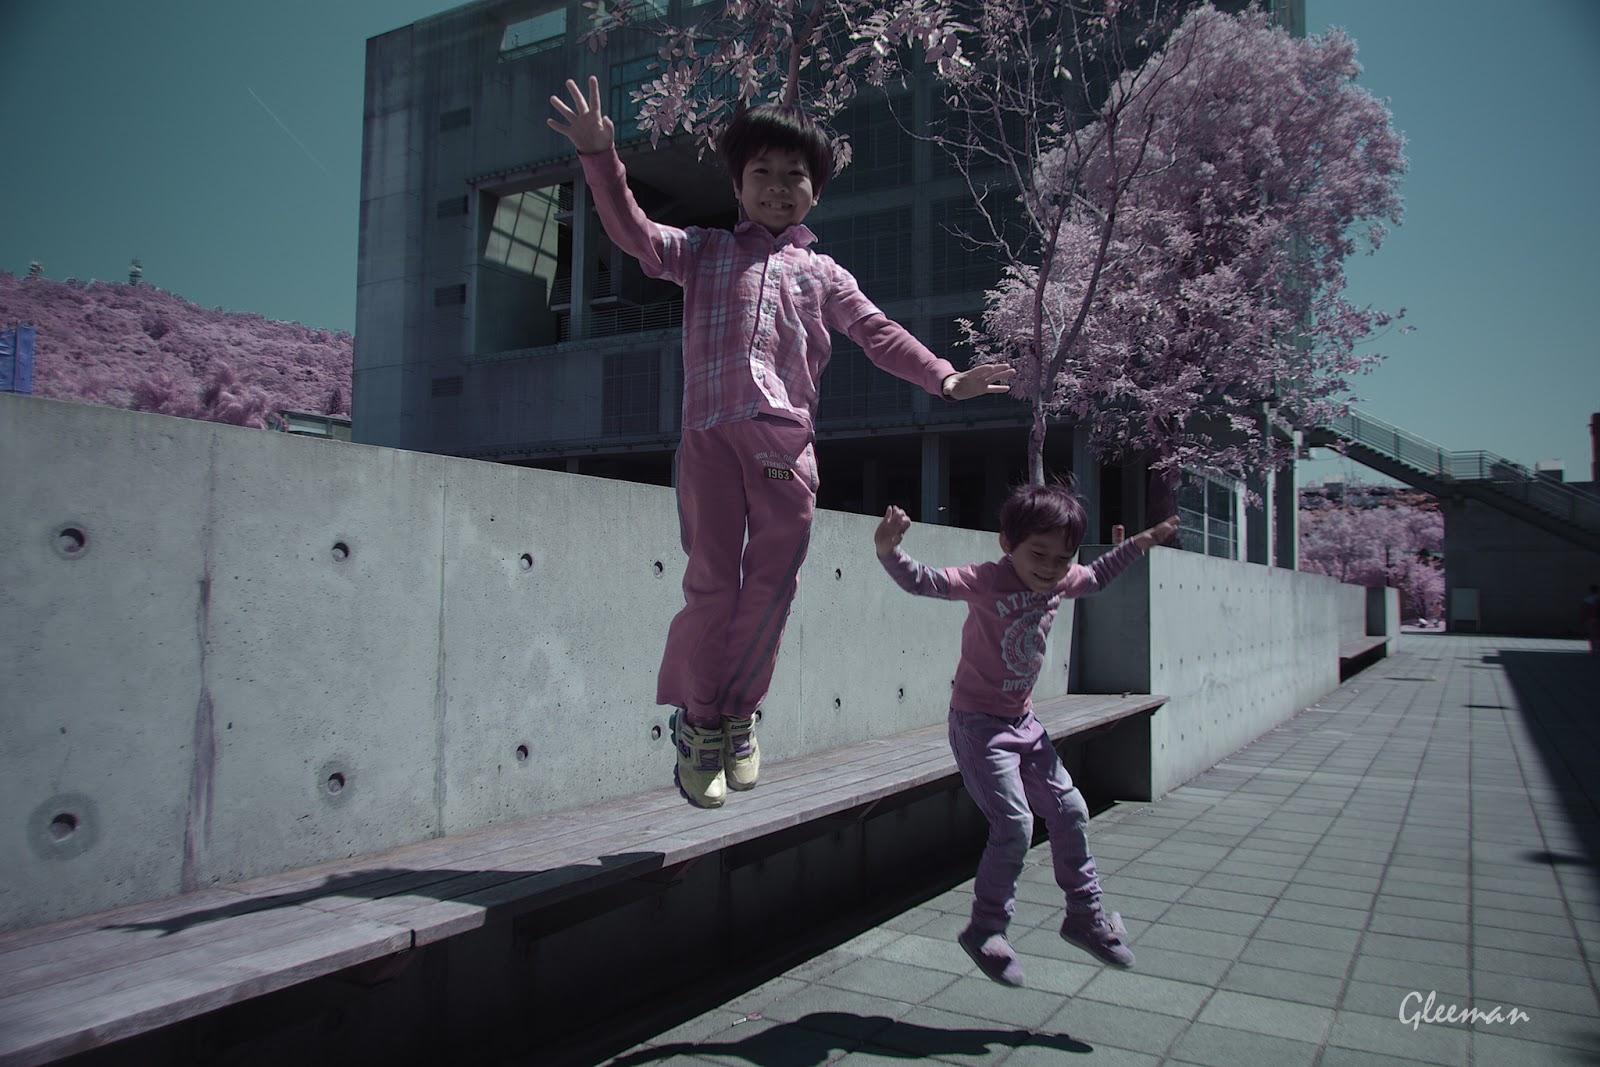 彩色紅外線攝影 (Pentax K5 Color IR Photography), Jump again!